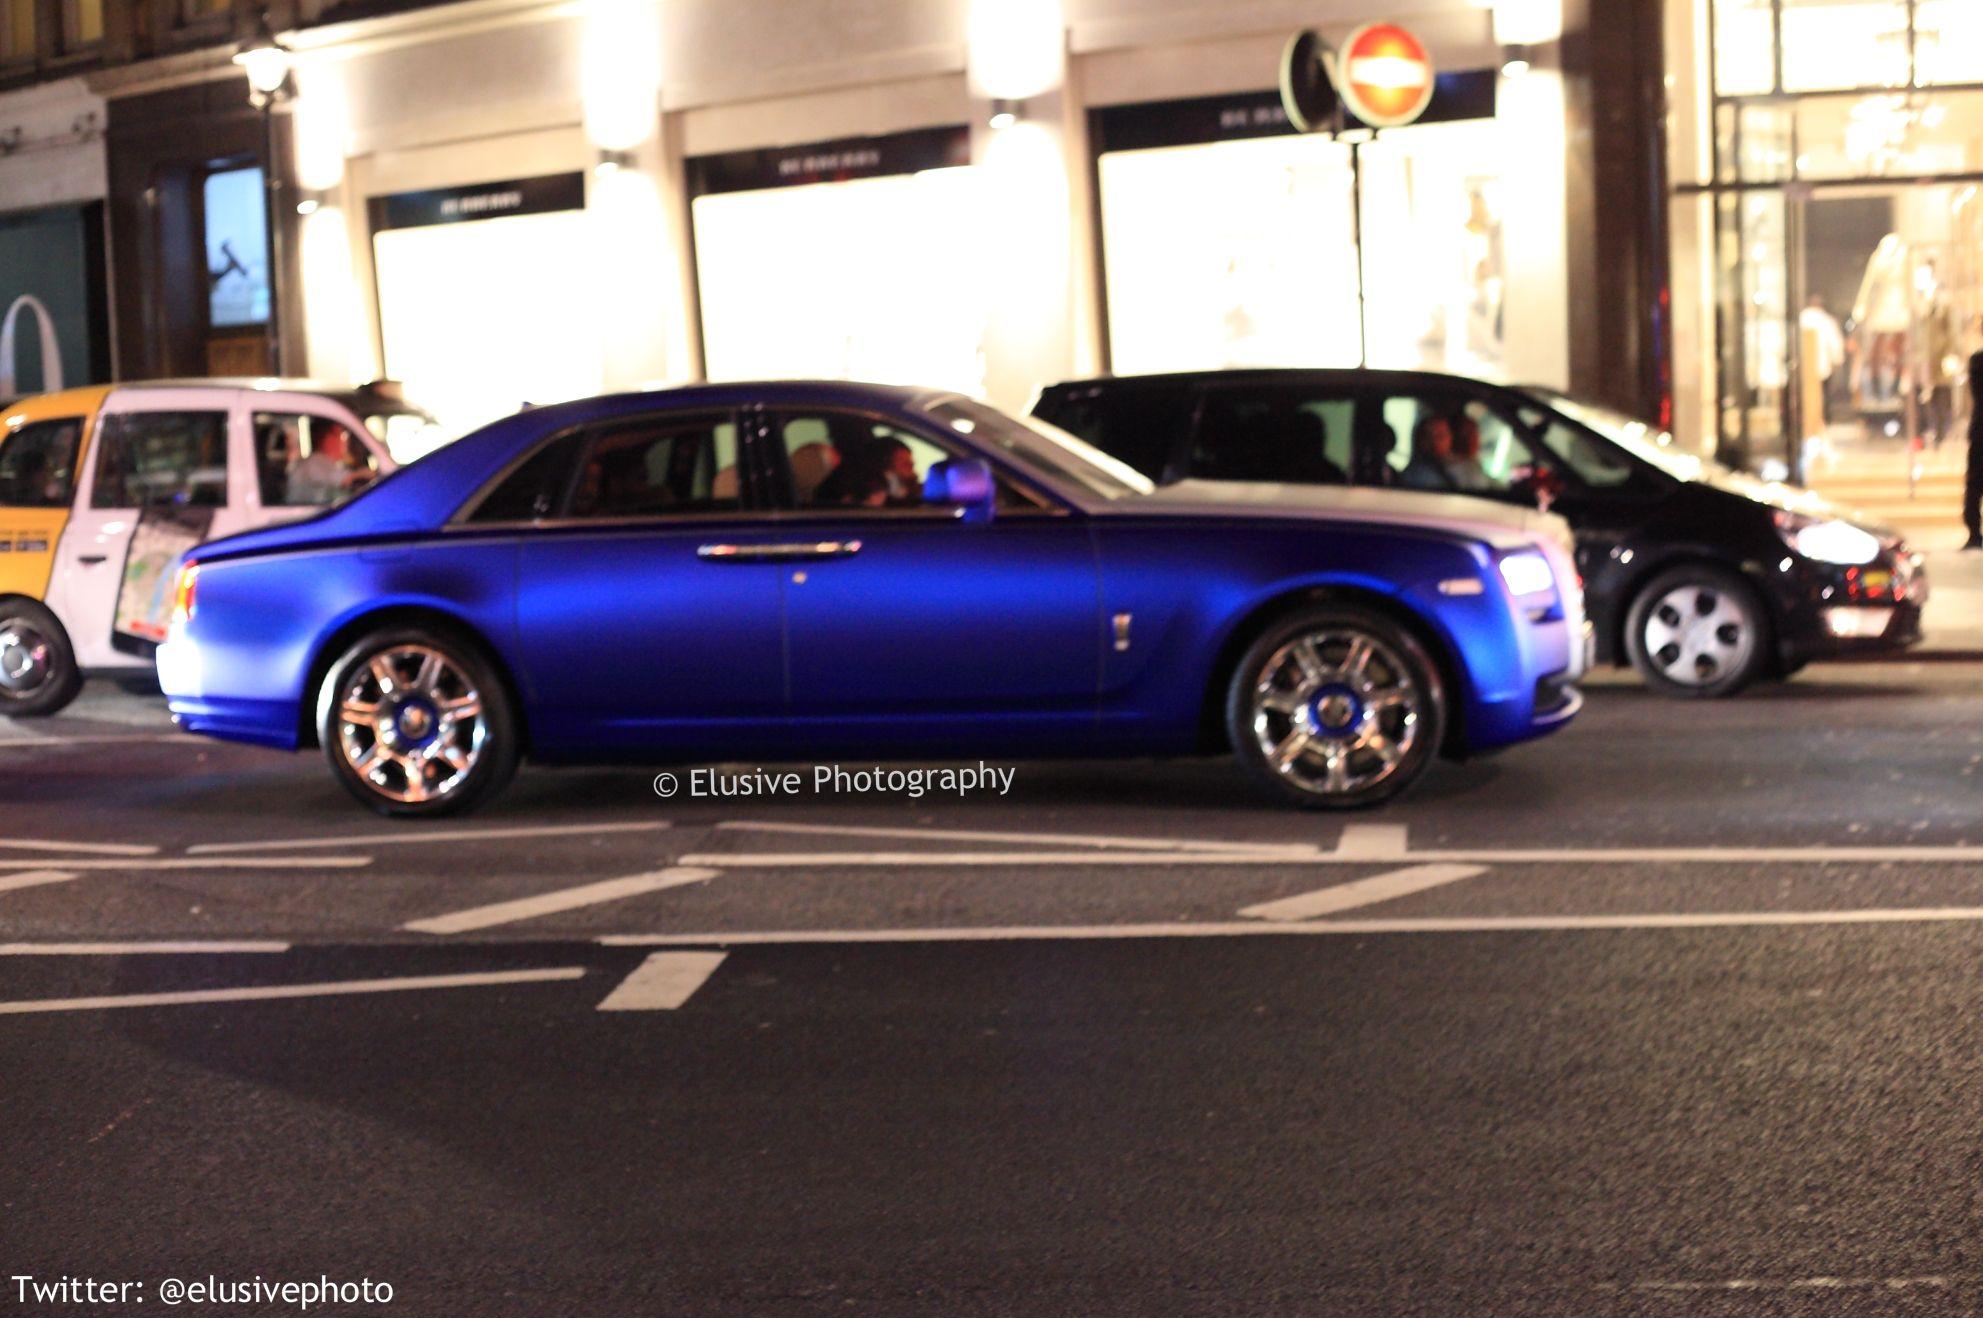 Rolls Royce Rolls Royce Cars London Road Uae Dubai